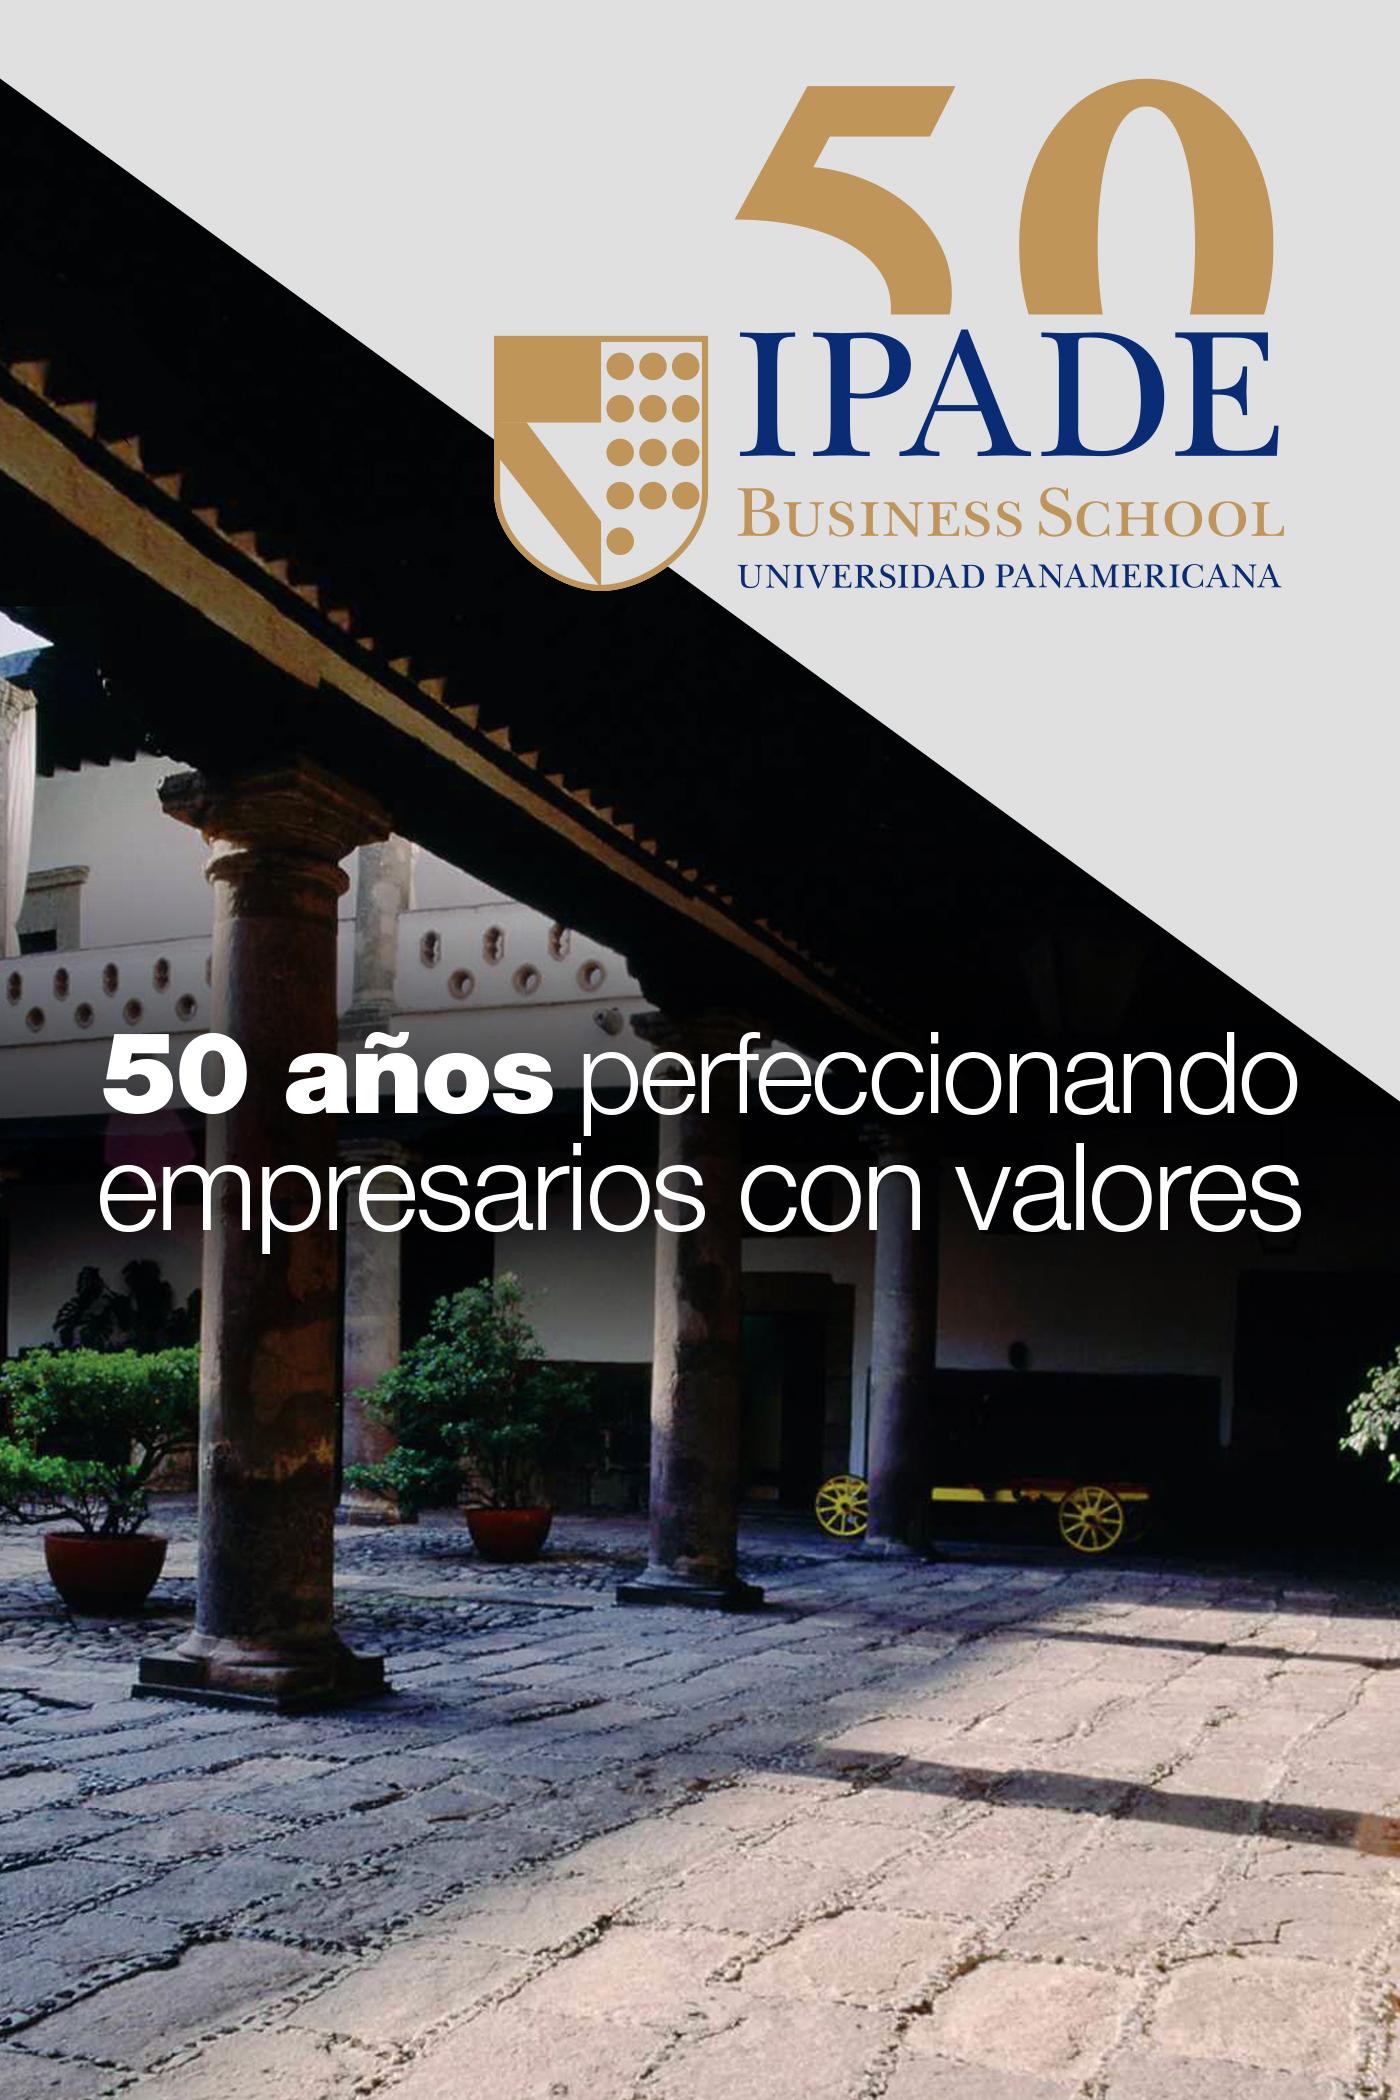 IPADE_iTunes_01.jpg